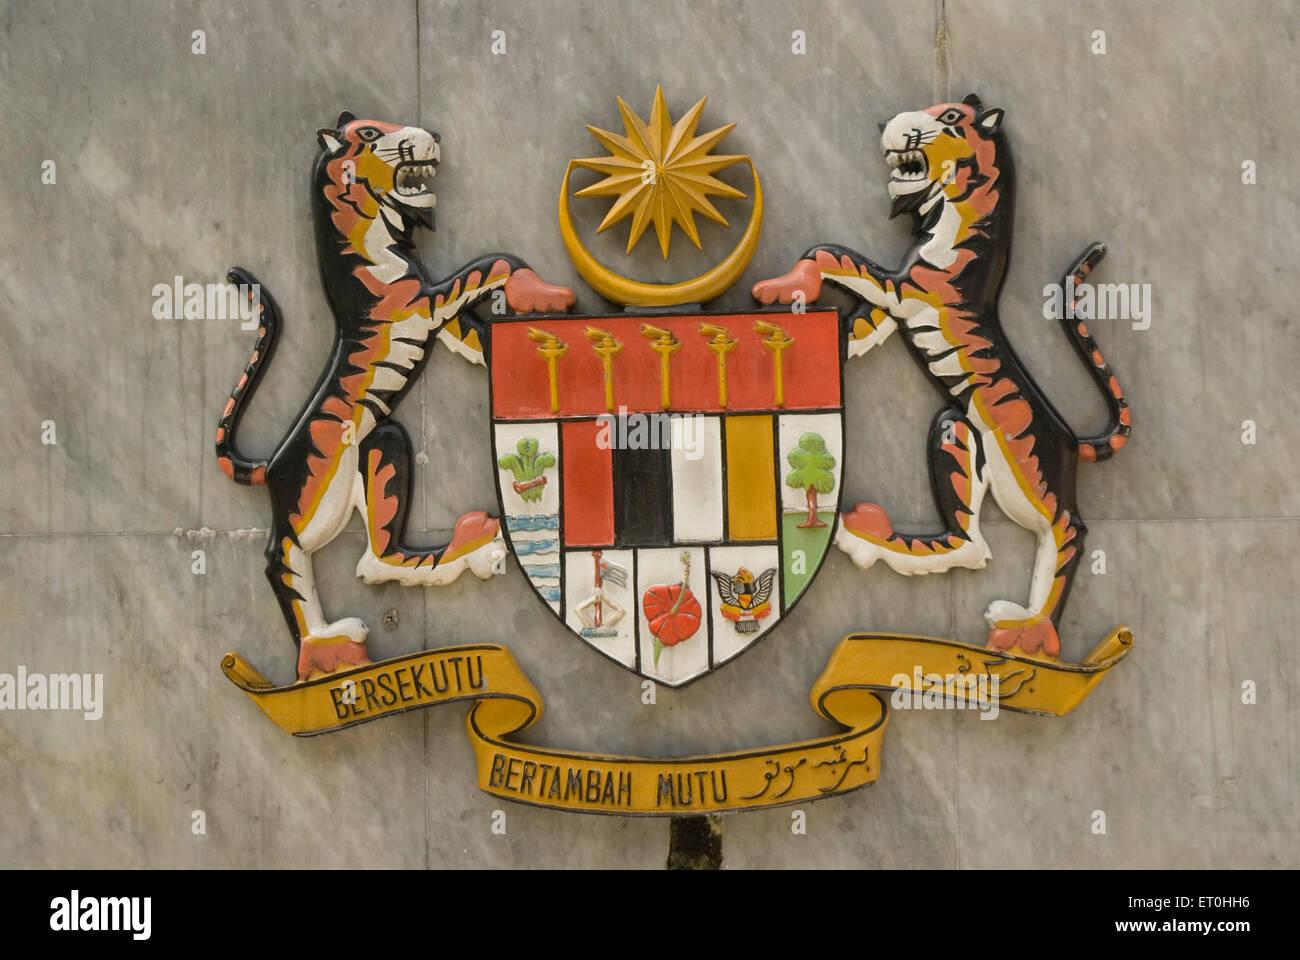 Emblem of Natiional monument at Kuala lampur Malaysia Asia - Stock Image